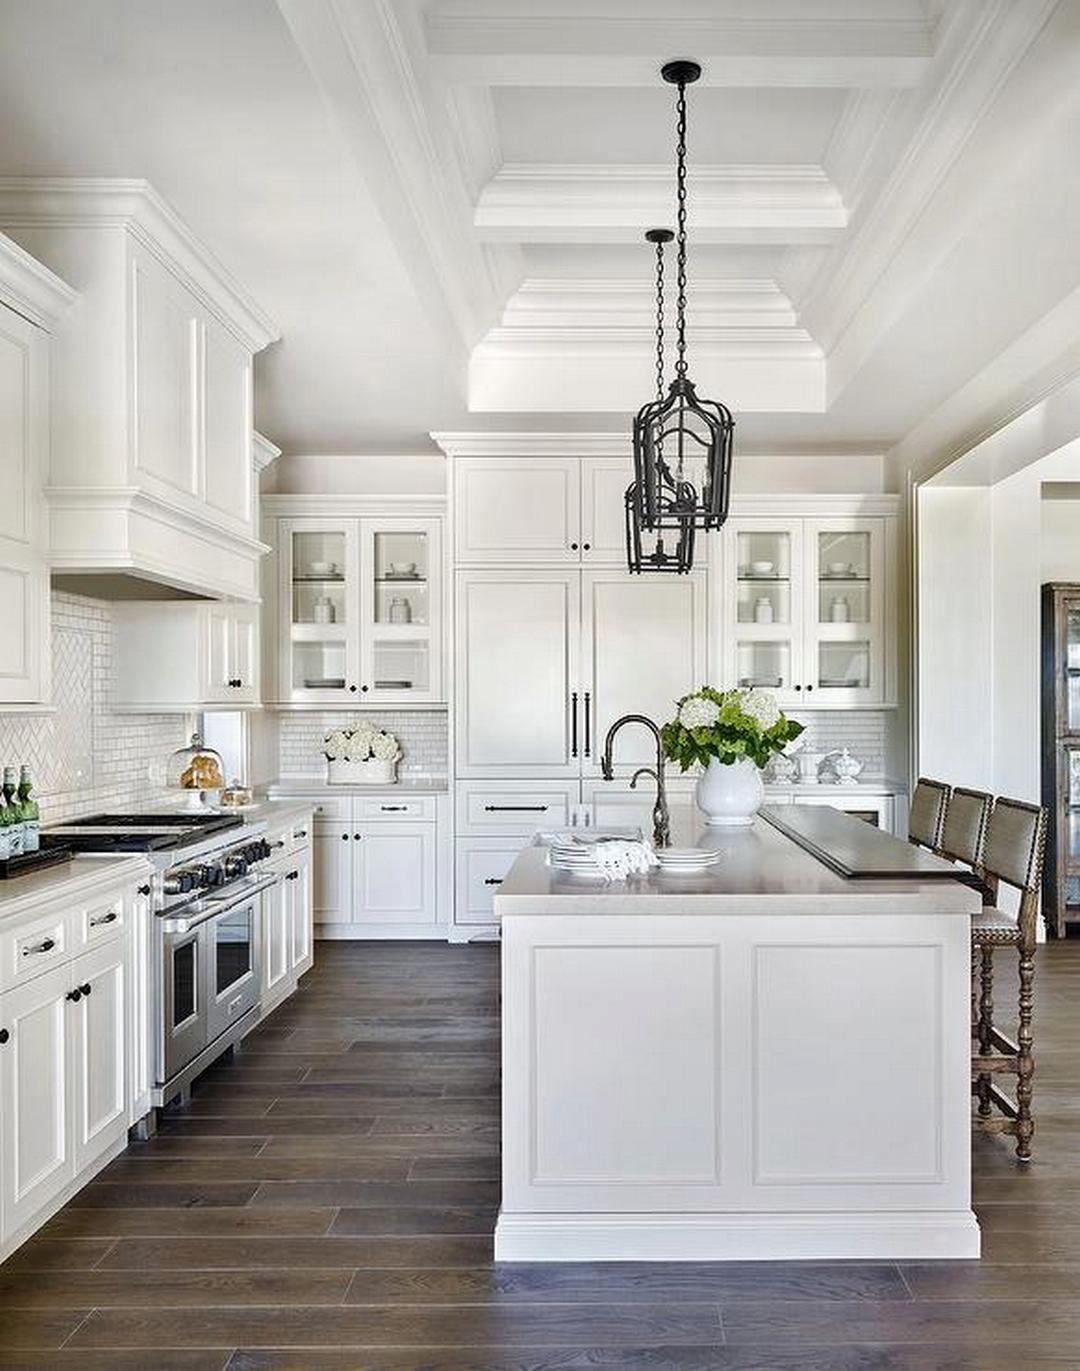 Uncategorized White Kitchens Designs pretty white kitchen design idea 25 kitchens and 25